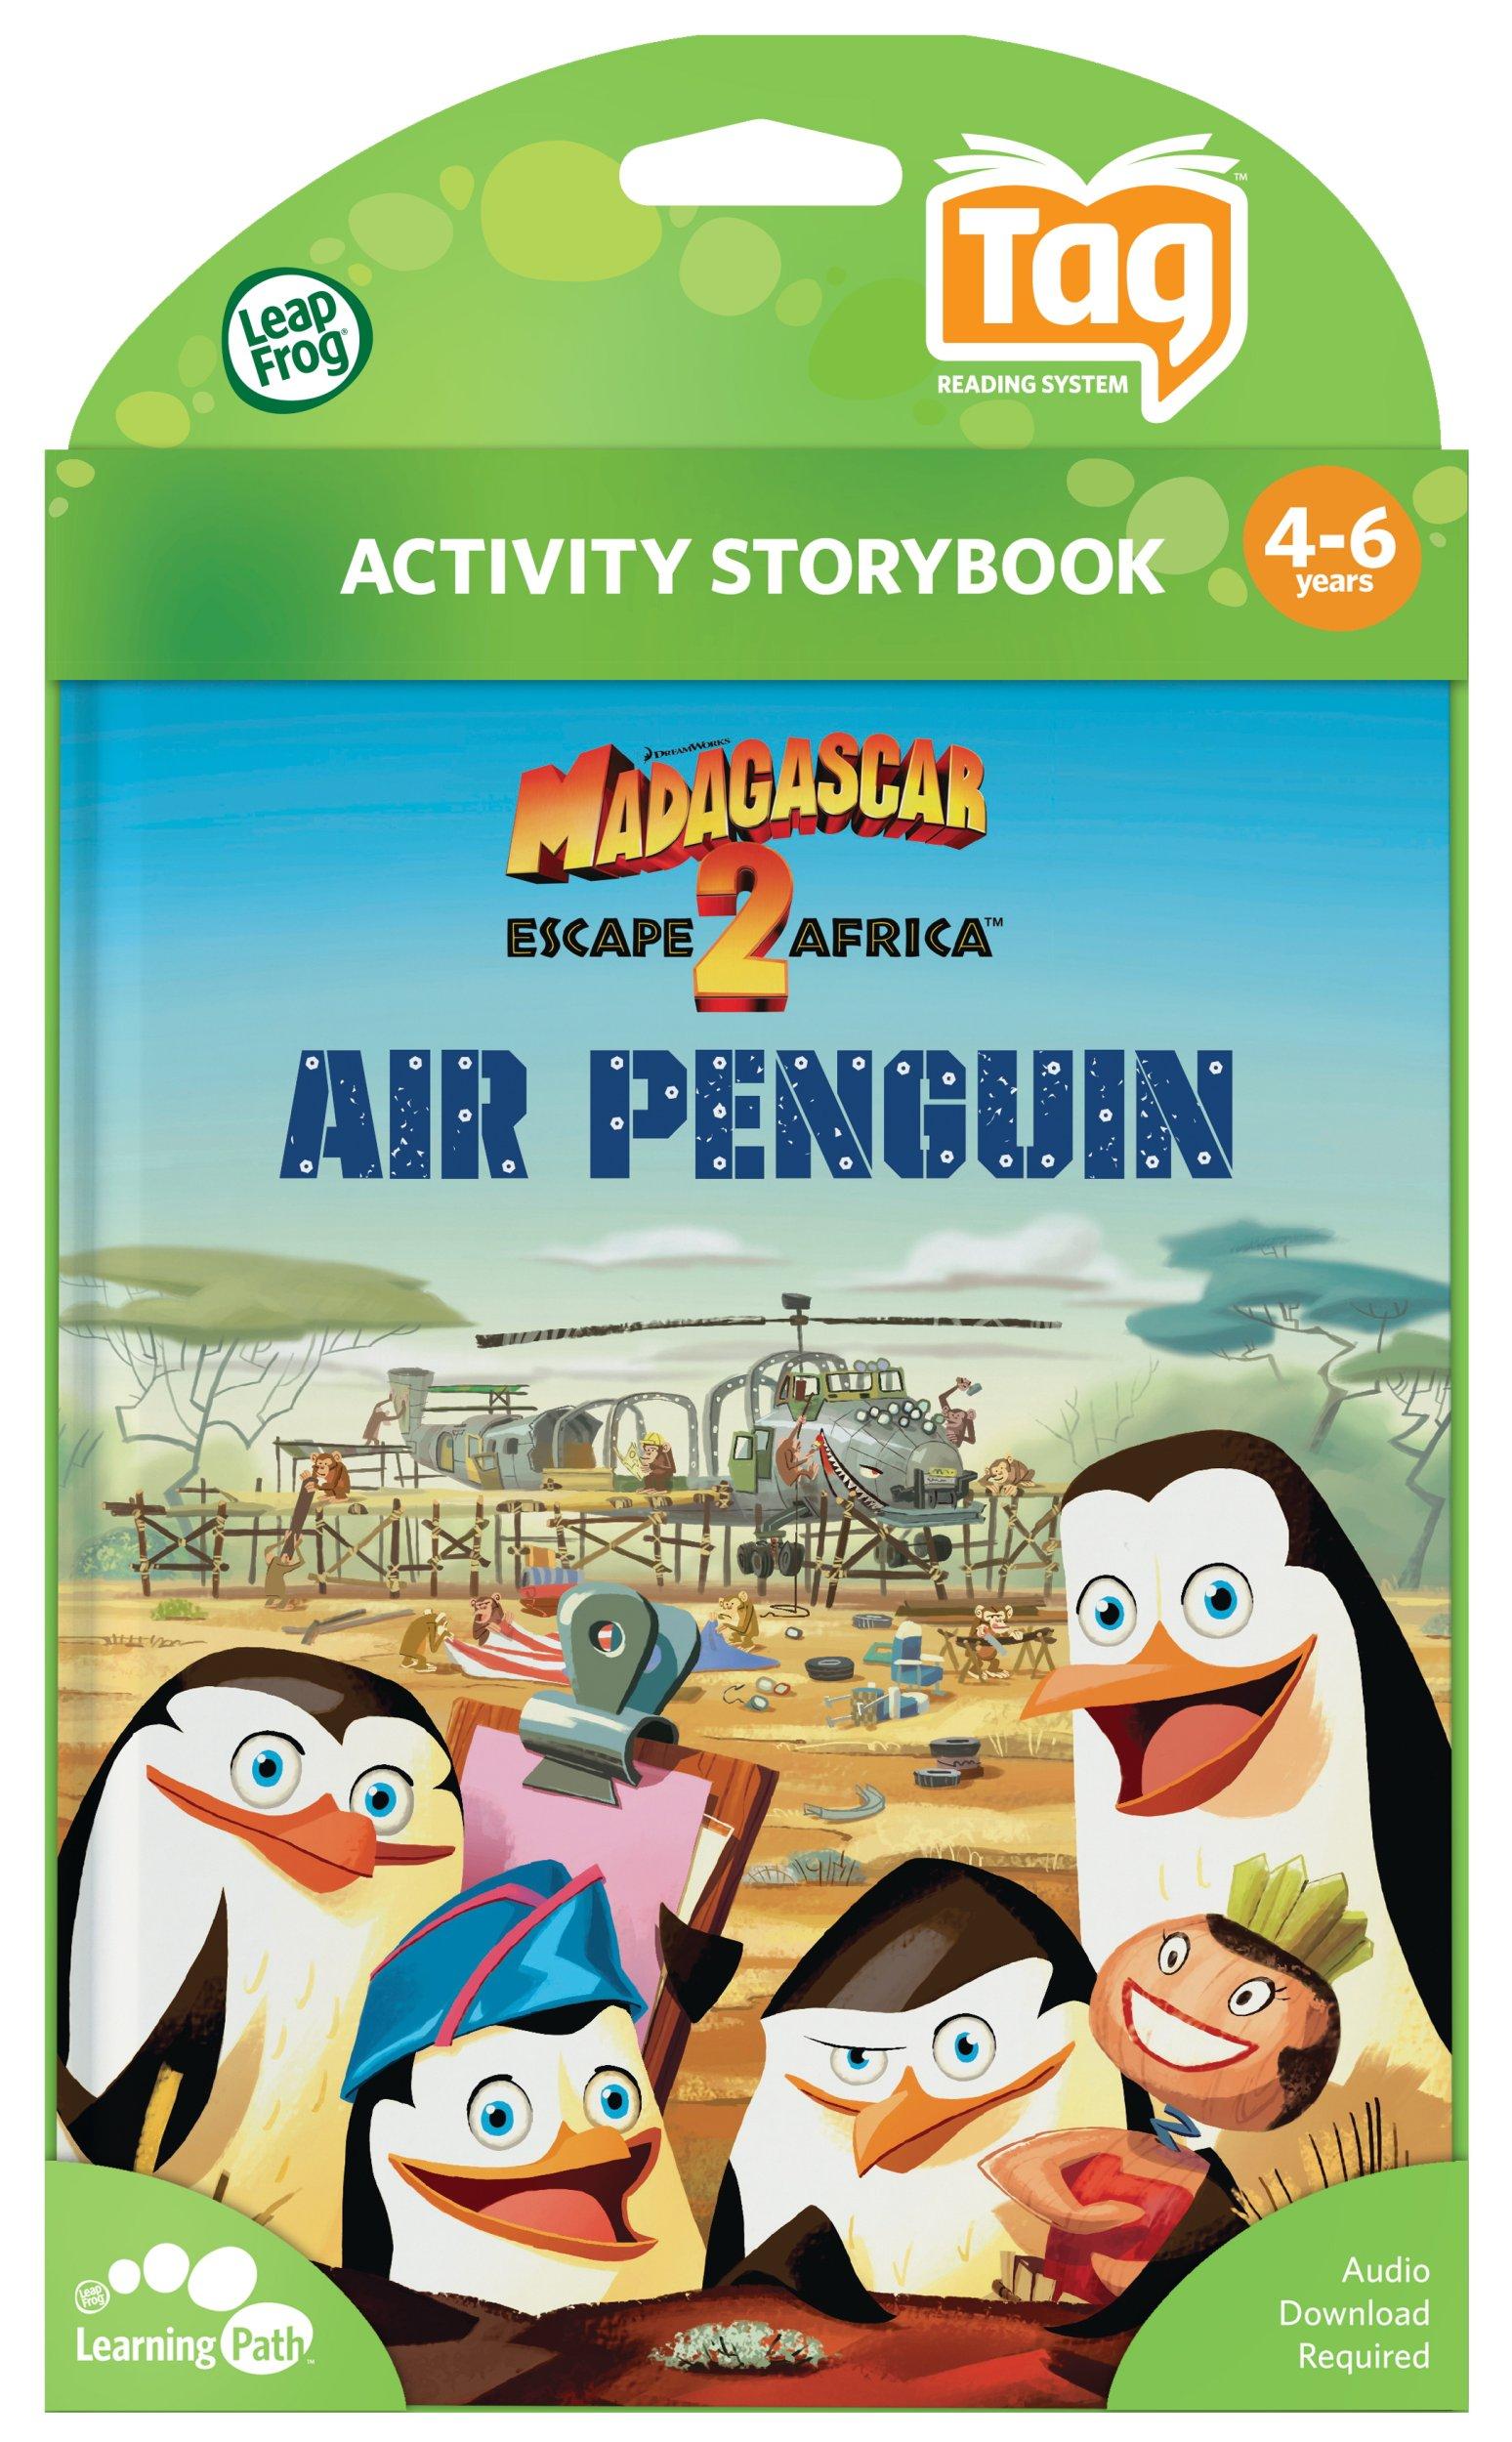 Leapfrog LeapReader & Tag Activity Storybook Madagascar: Escape 2 Africa Air Penguin by LeapFrog (Image #4)